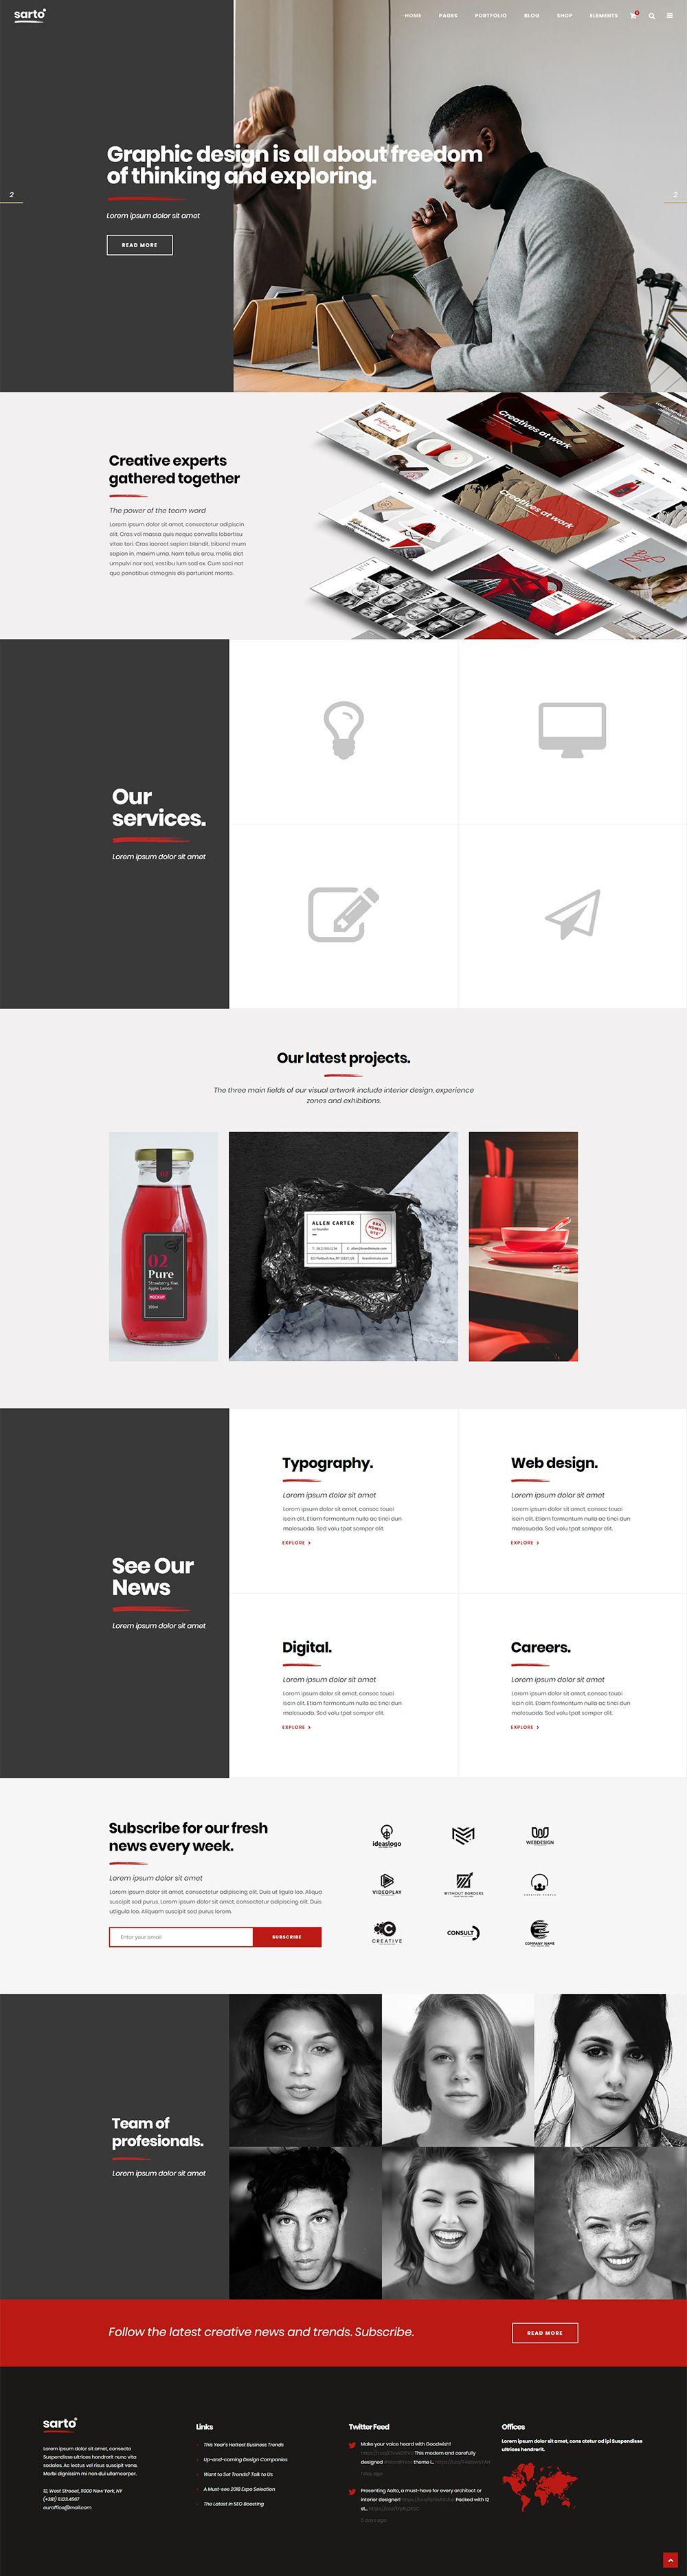 Tell Your Creative Business Story With Sarto Wordpress Theme Wordpress Design Theme Layout Te Wordpress Theme Design Web Design Company Web Design Trends